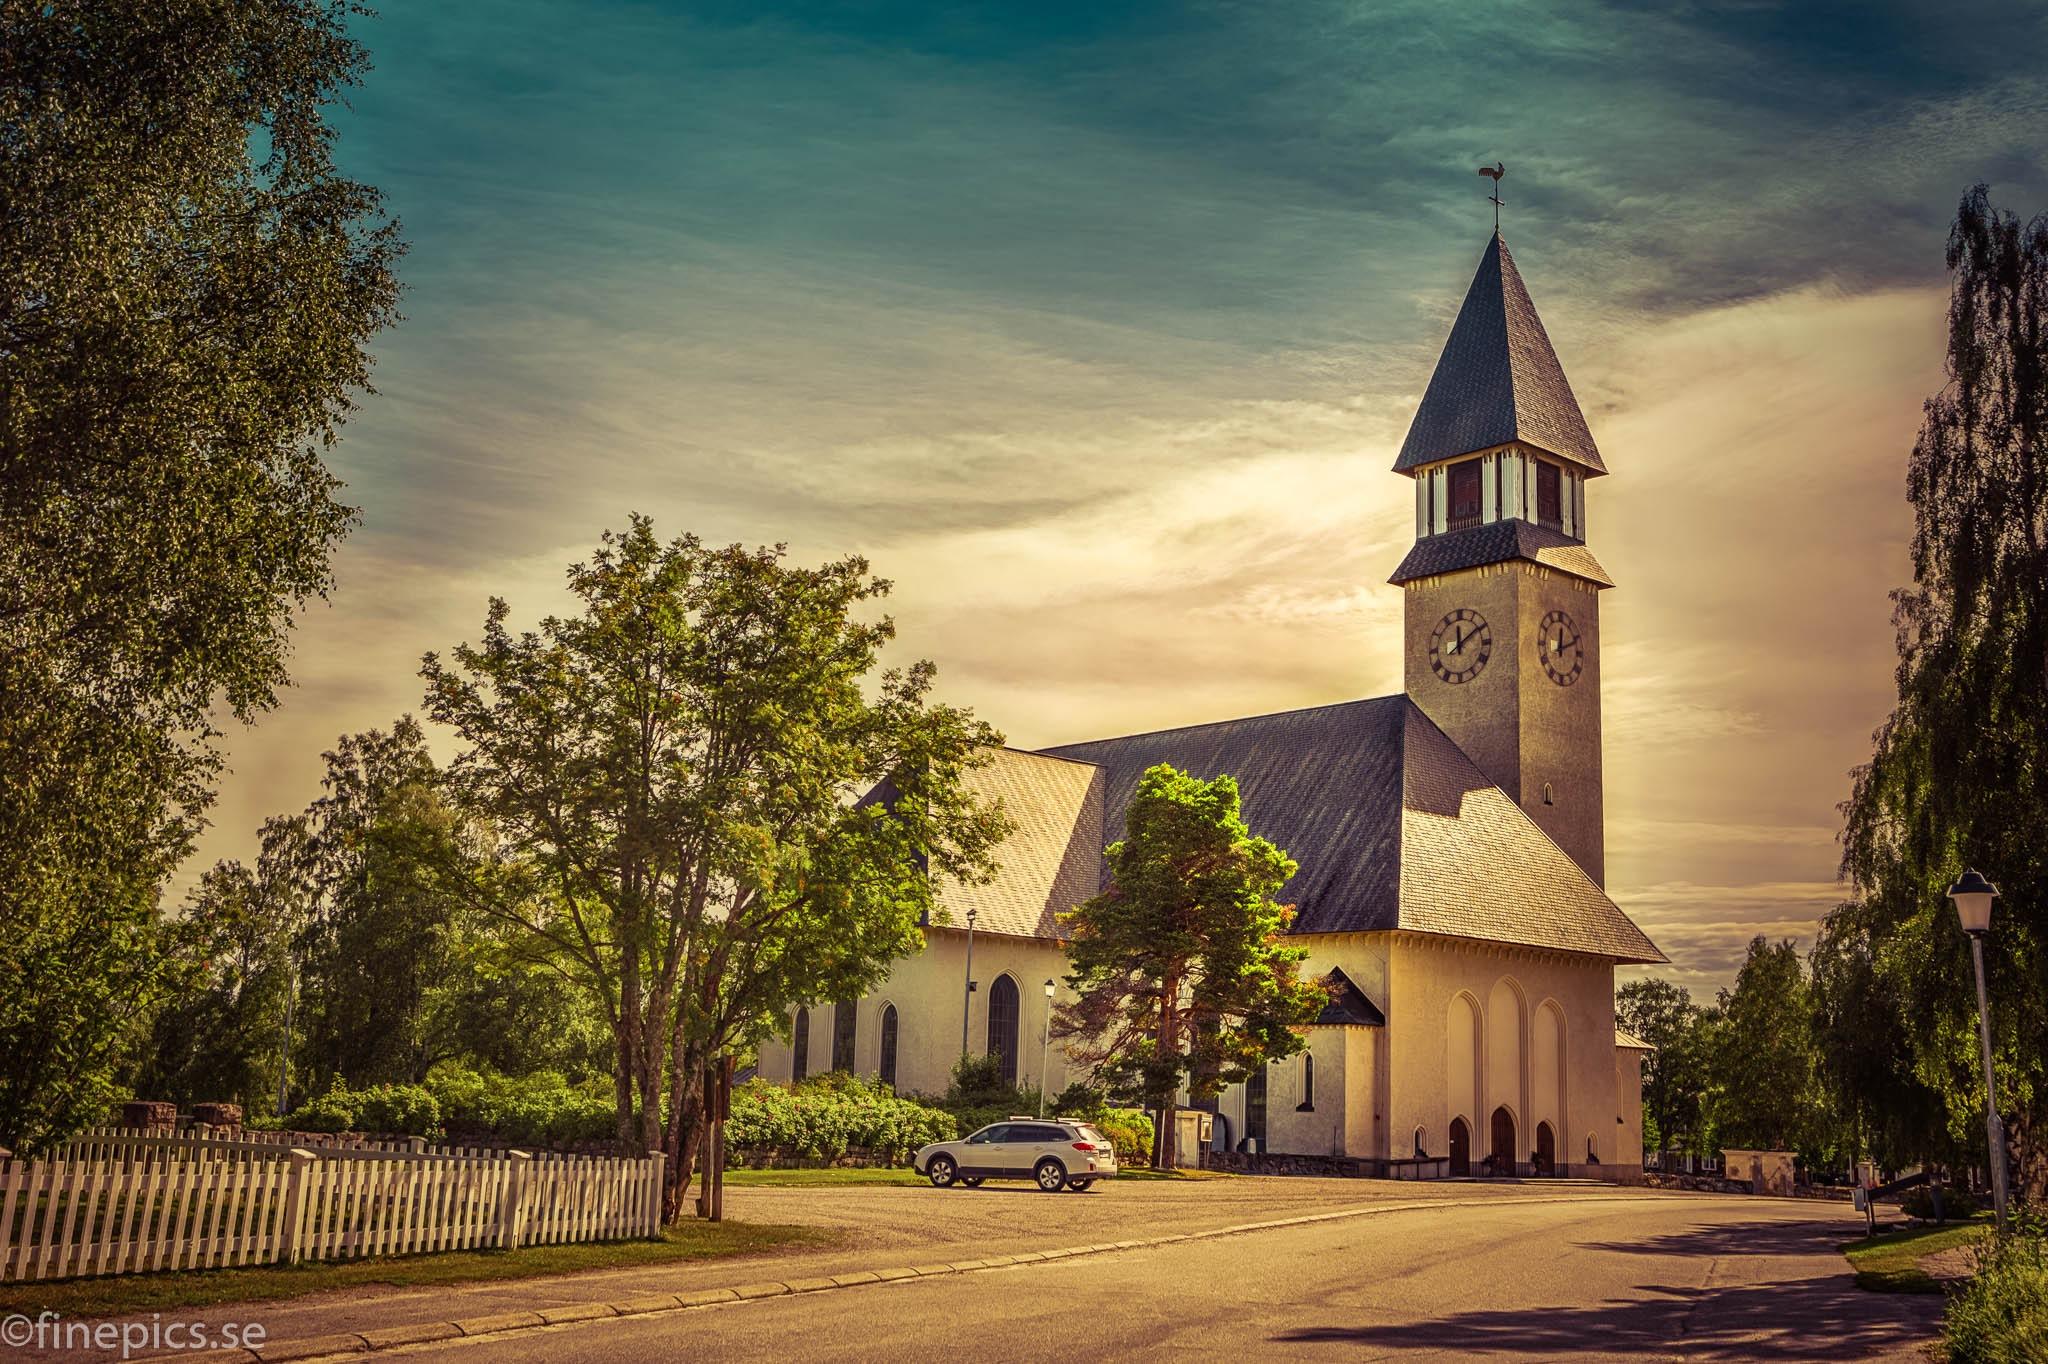 Burträsk church by Johan Bergenstråhle